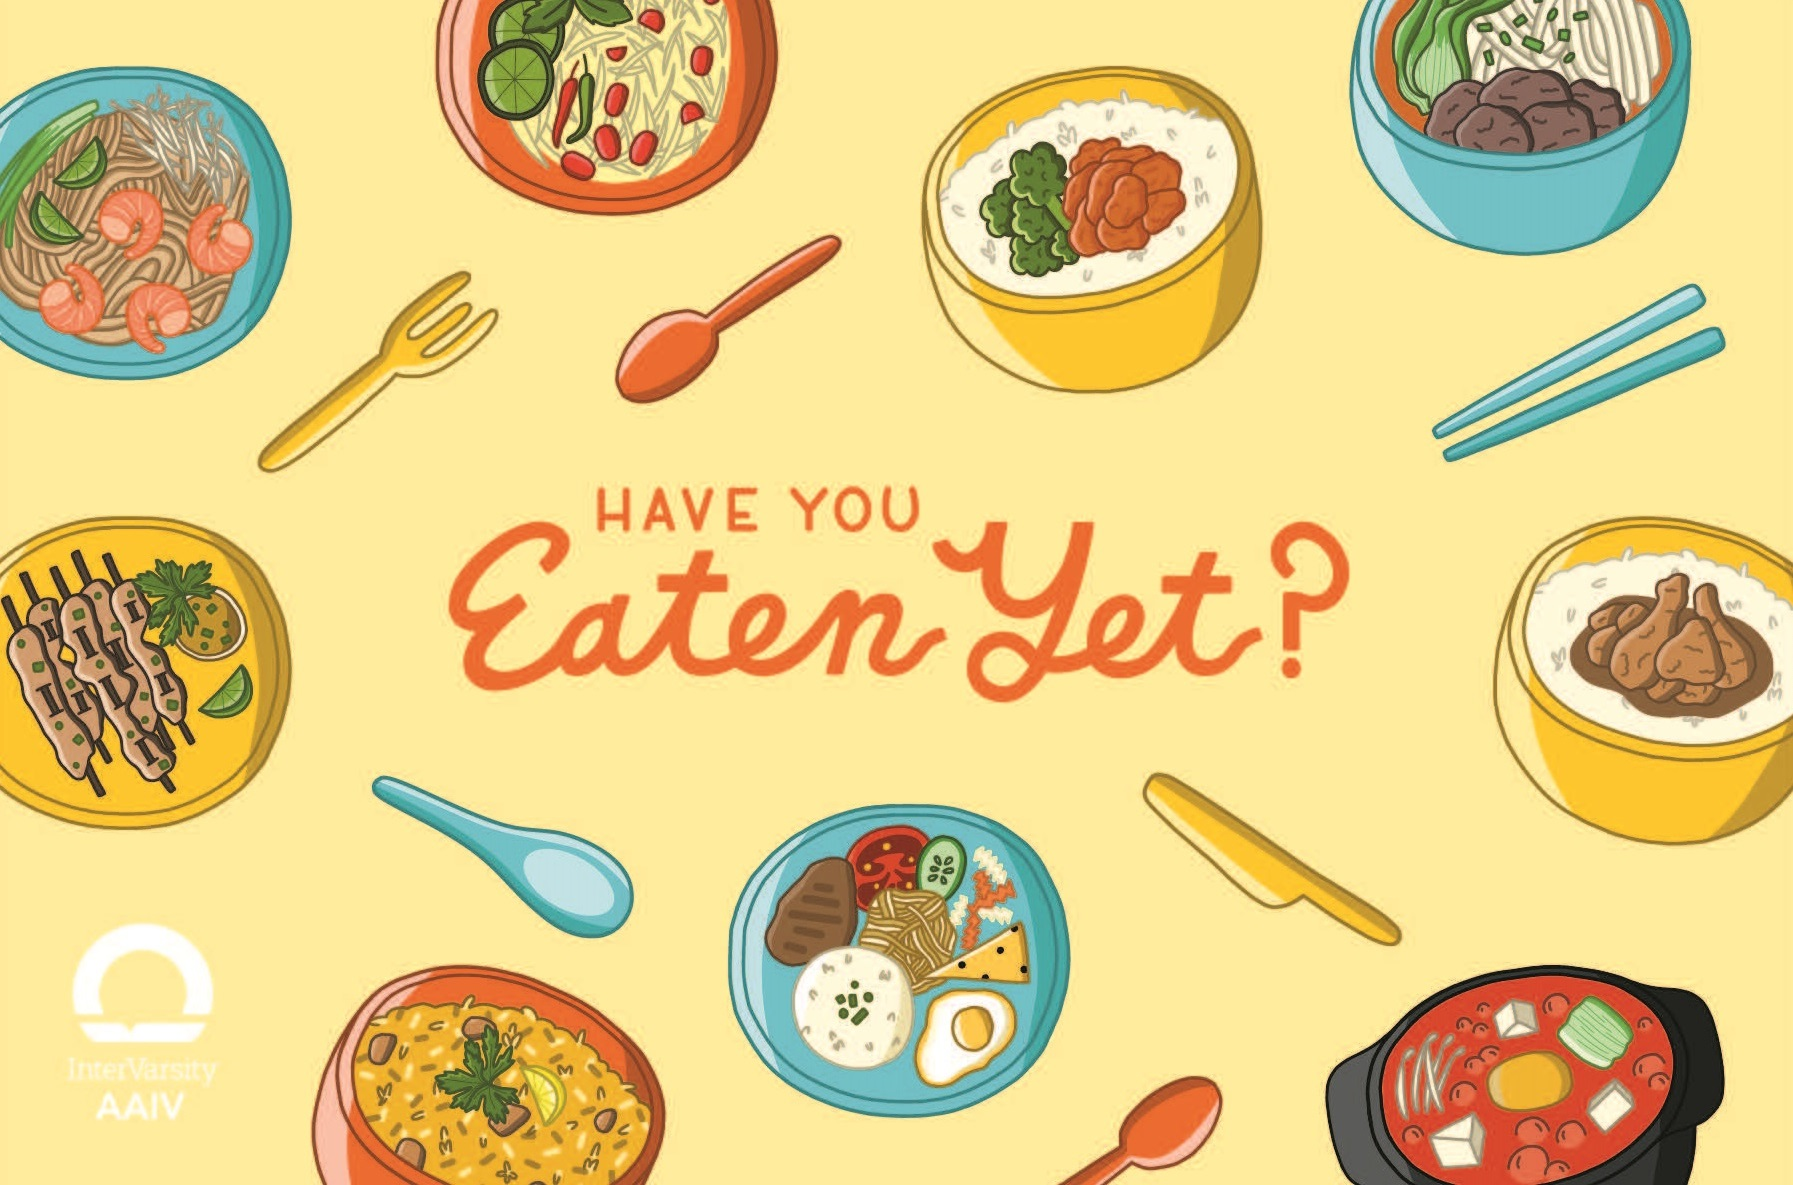 Have You Eaten Yet? - Postcard (bundle of 25)